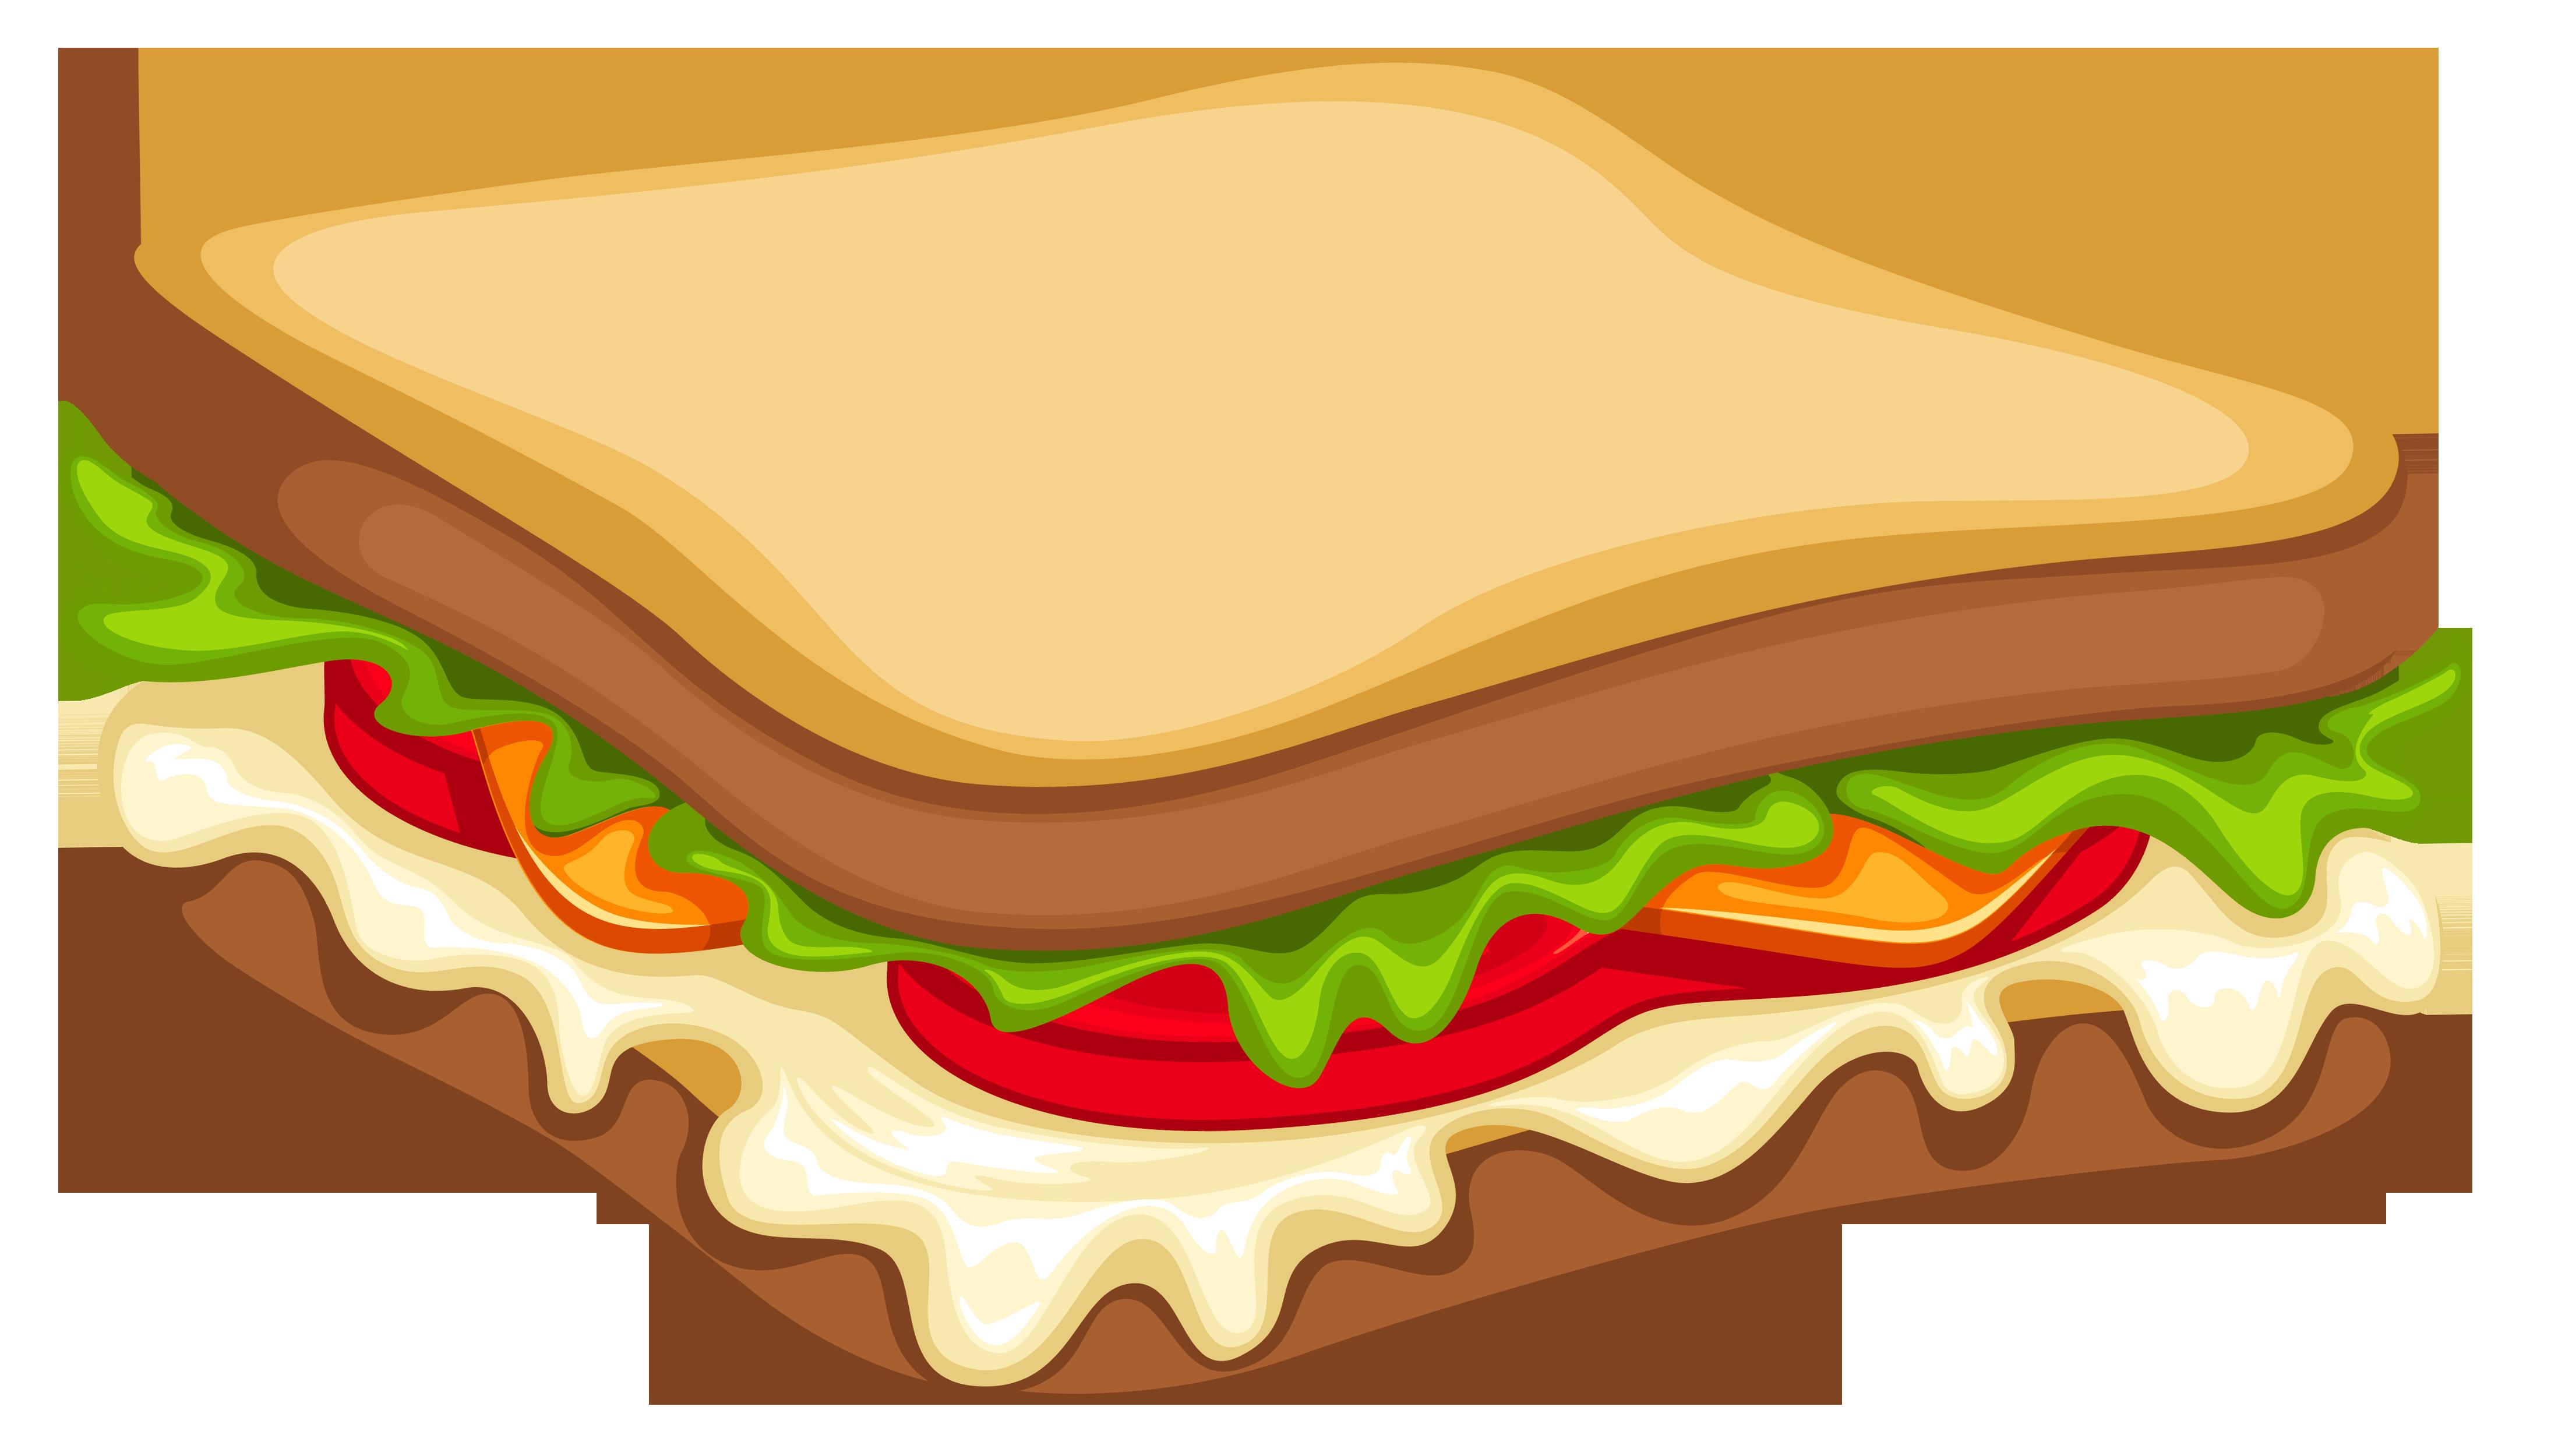 4379x2500 T Shirt Cranberry Pig Sandwich Vector Template For Download